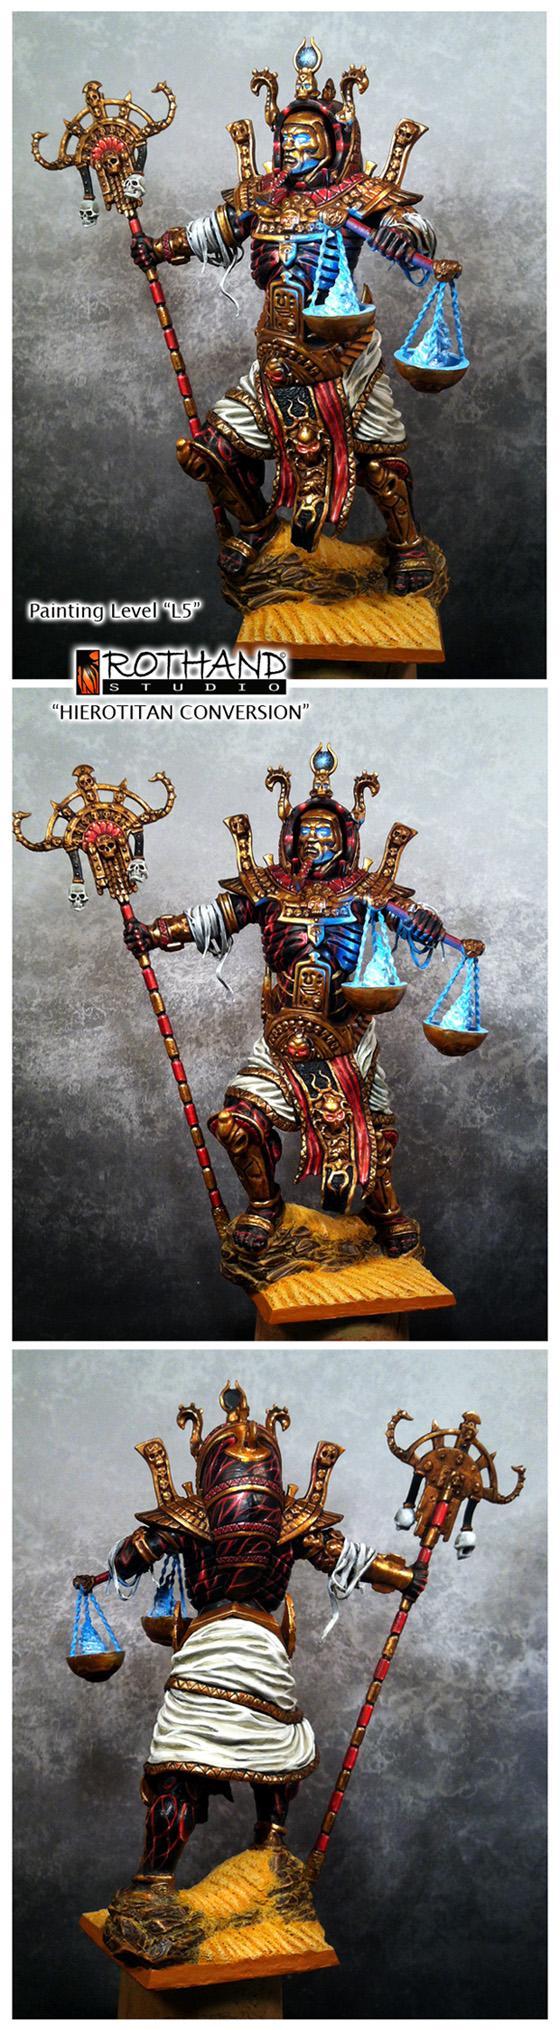 Bone Giant, Hierotitan, Hierotitan Conversion, Hierotitan Model, Necrosphinx, Tk, Tomb Kings